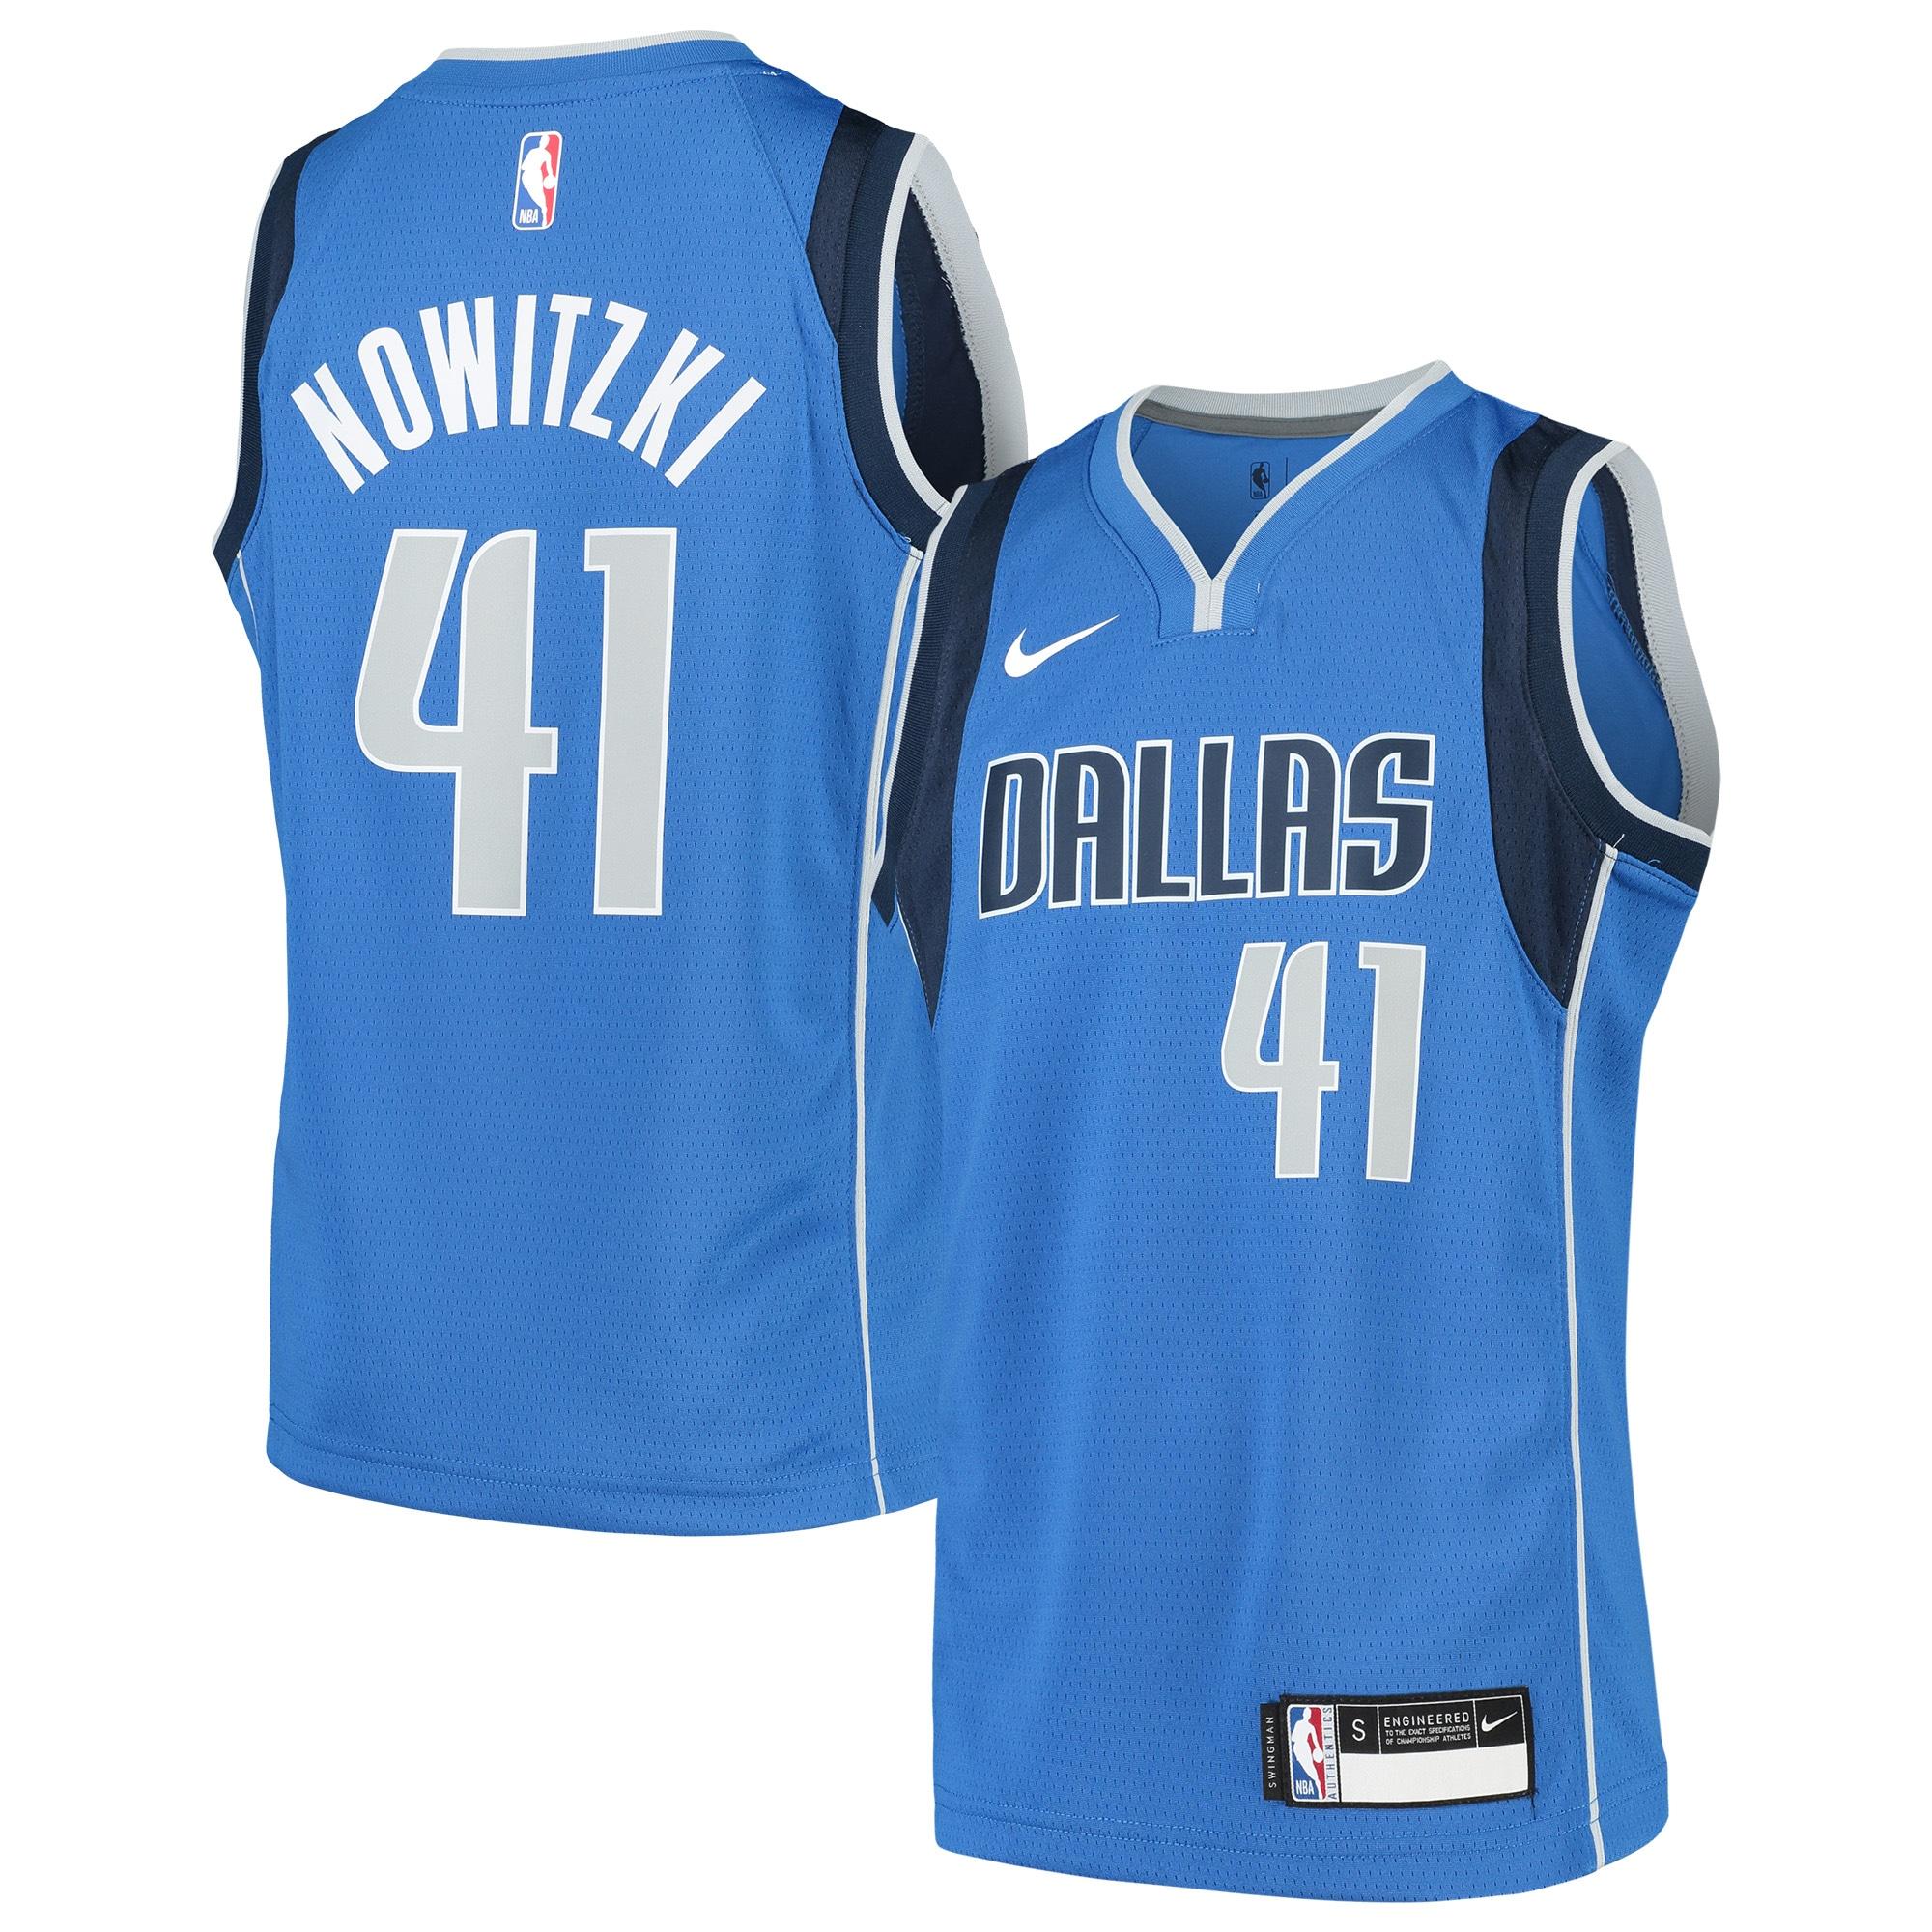 Dirk Nowitzki Dallas Mavericks Nike Youth Swingman Jersey Blue - Icon Edition